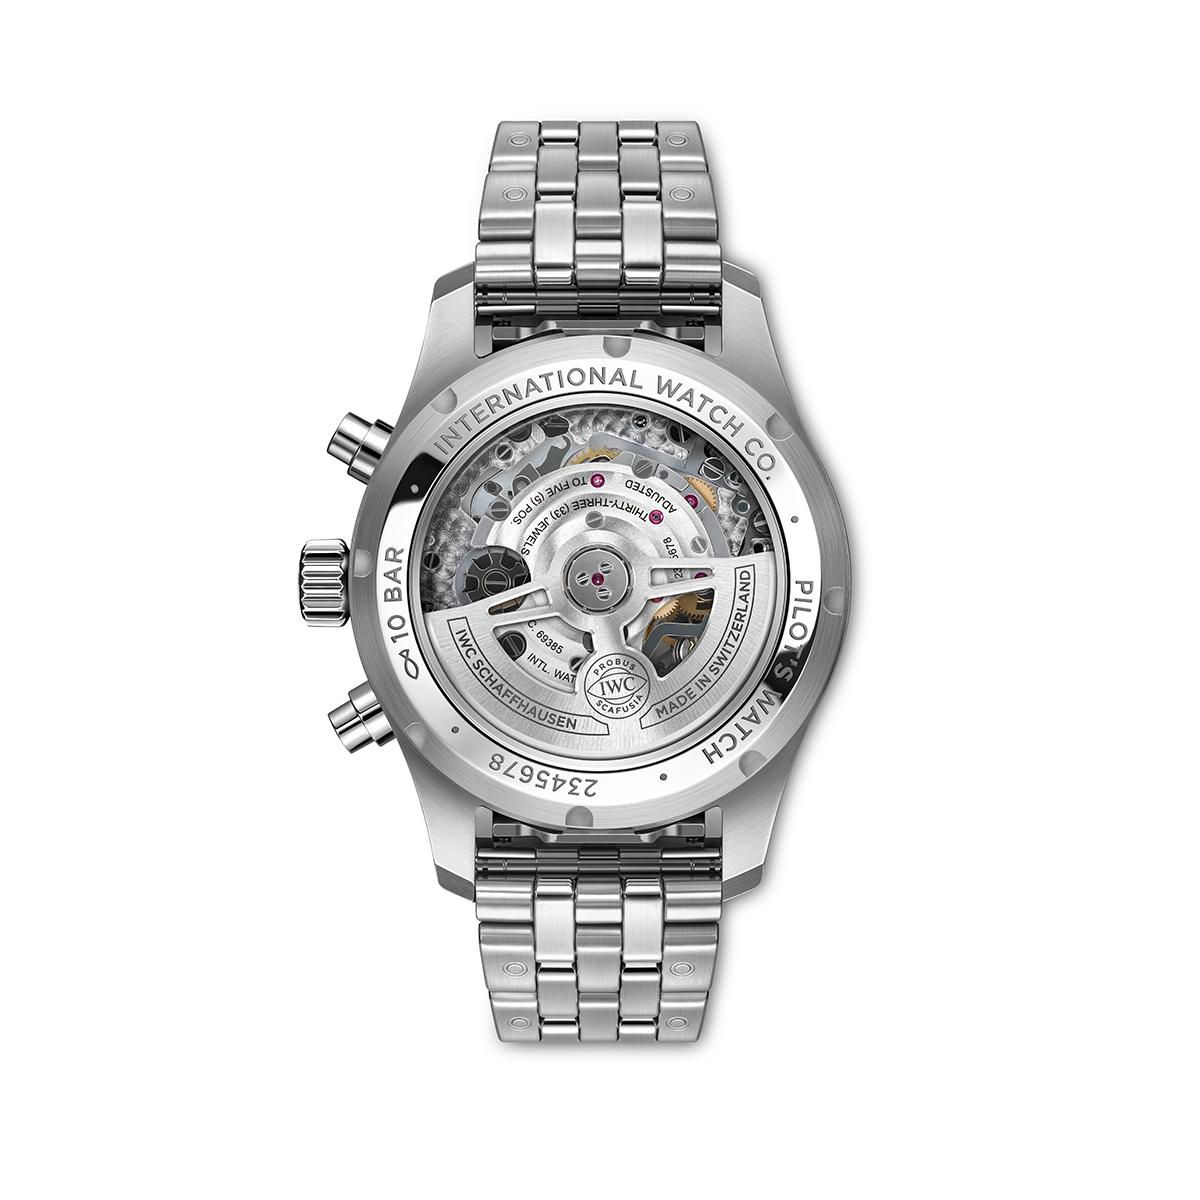 IWC Pilot's Watch Chronograph 41